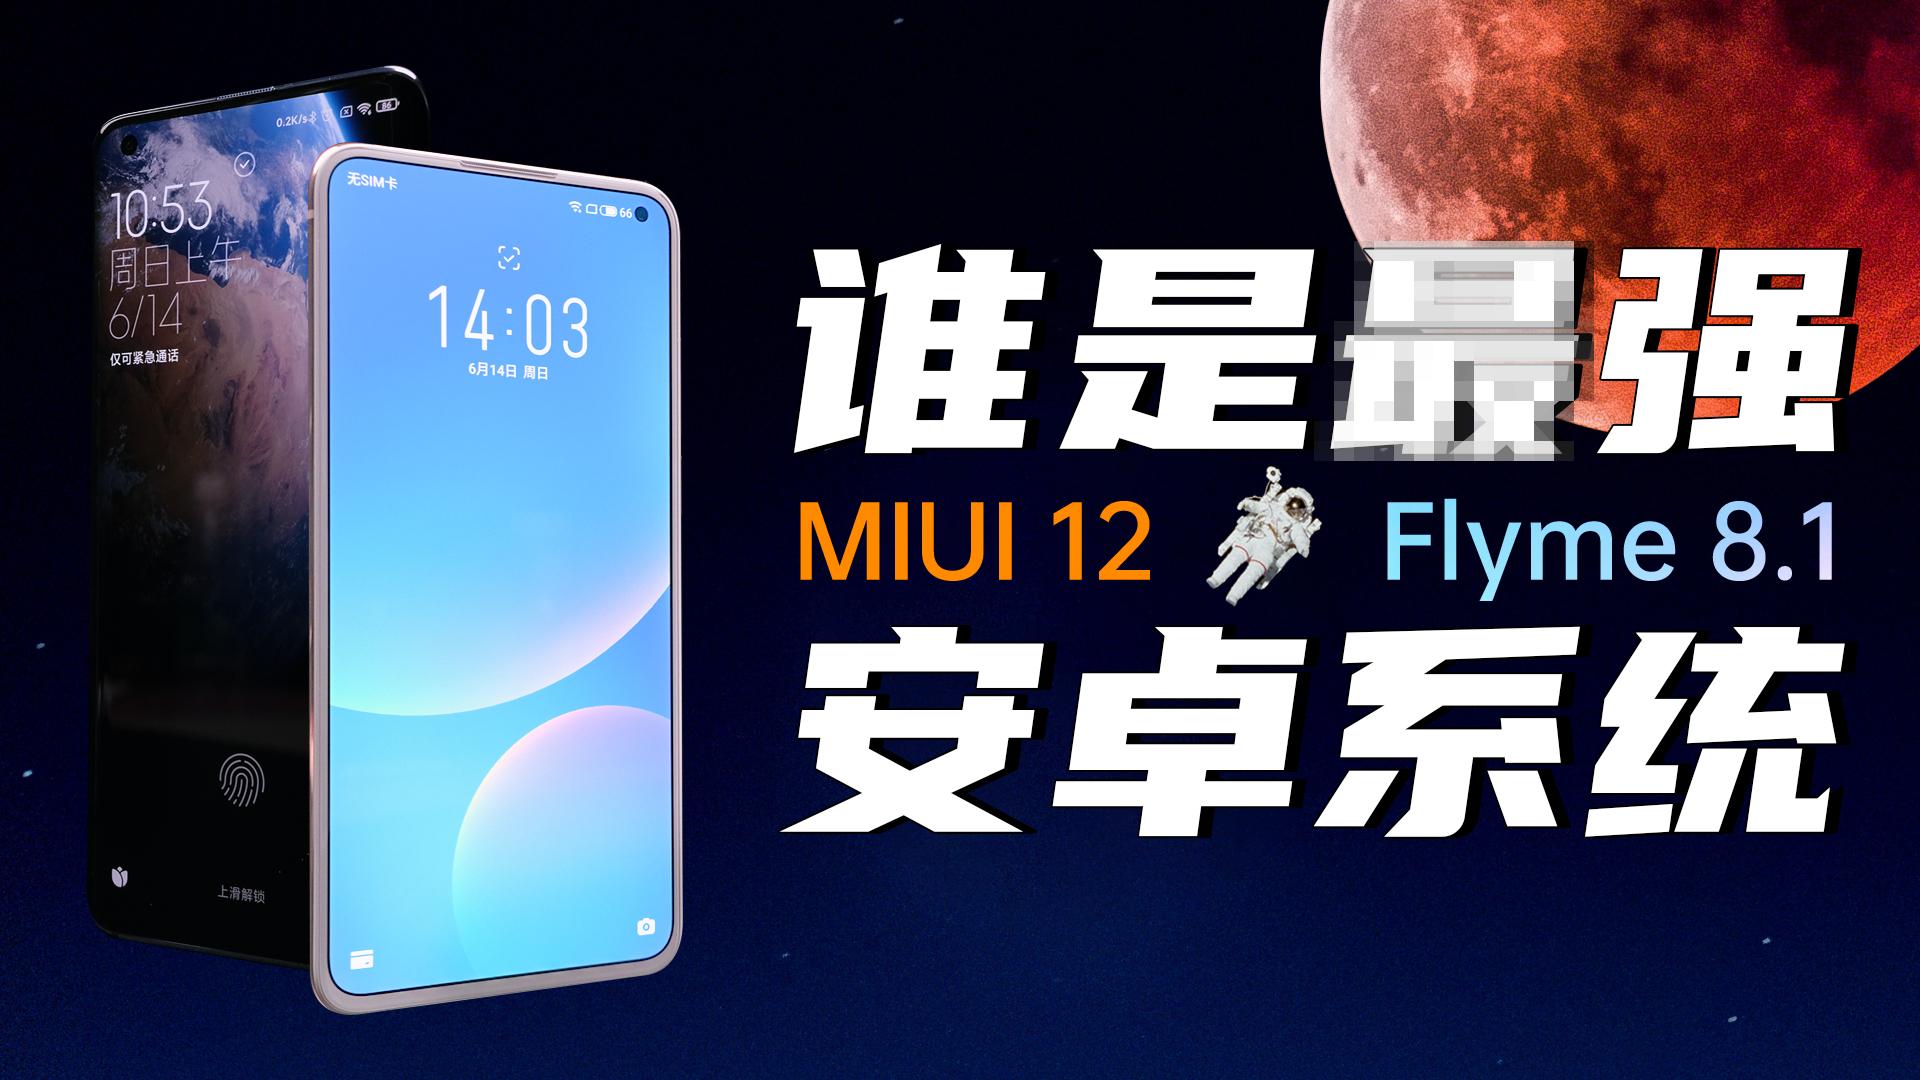 Flyme 8.1 VS MIUI 12深度评测,谁是最强安卓系统?